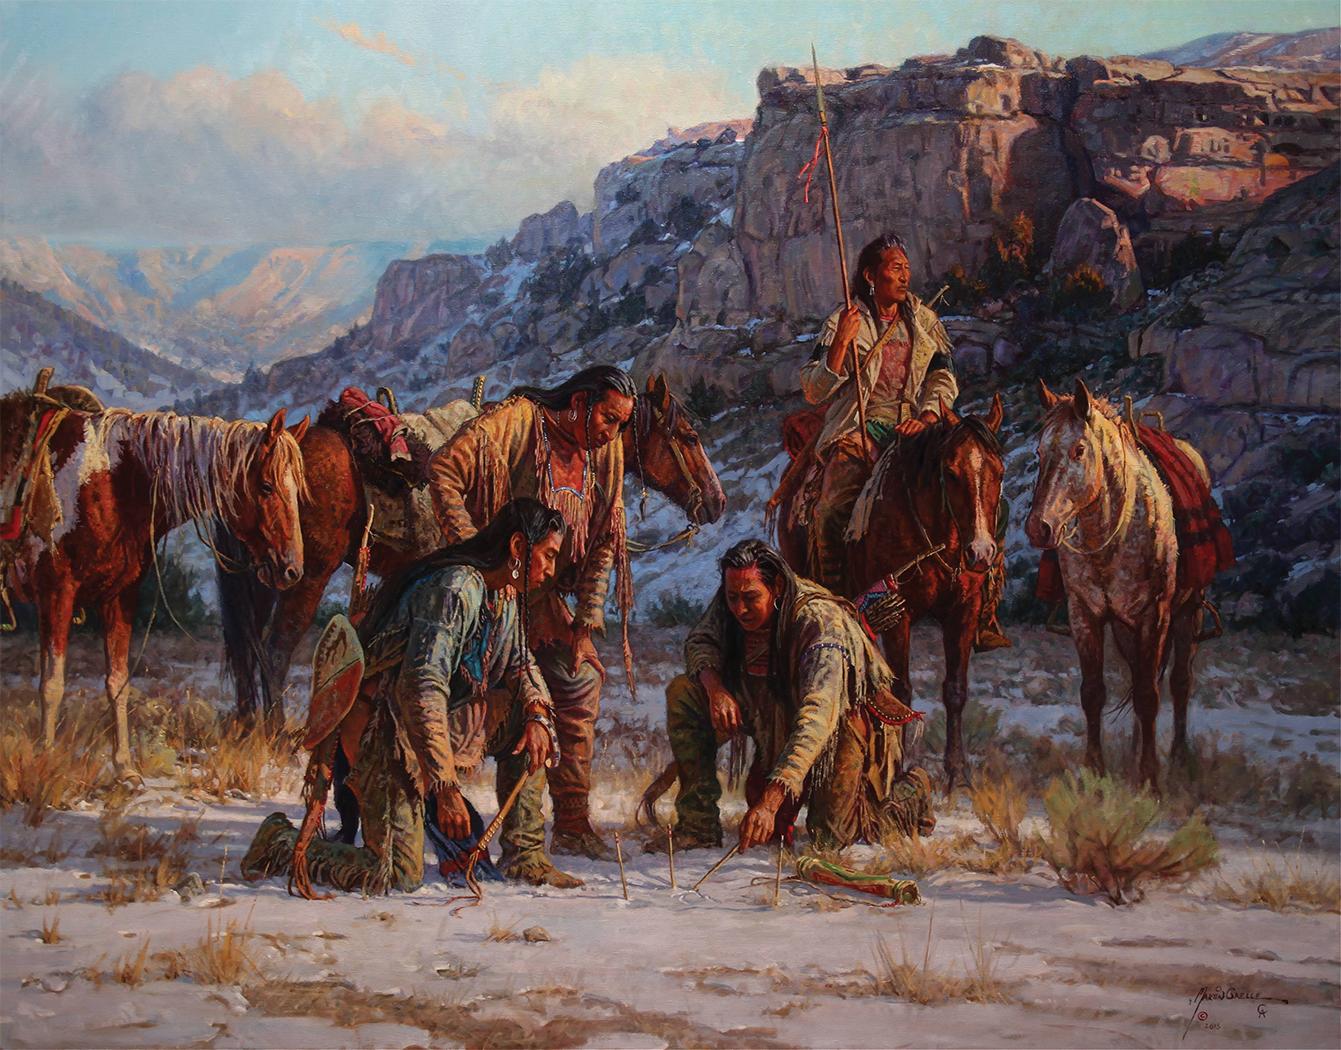 Cowboy Artists of America - National Cowboy & Western Heritage Museum